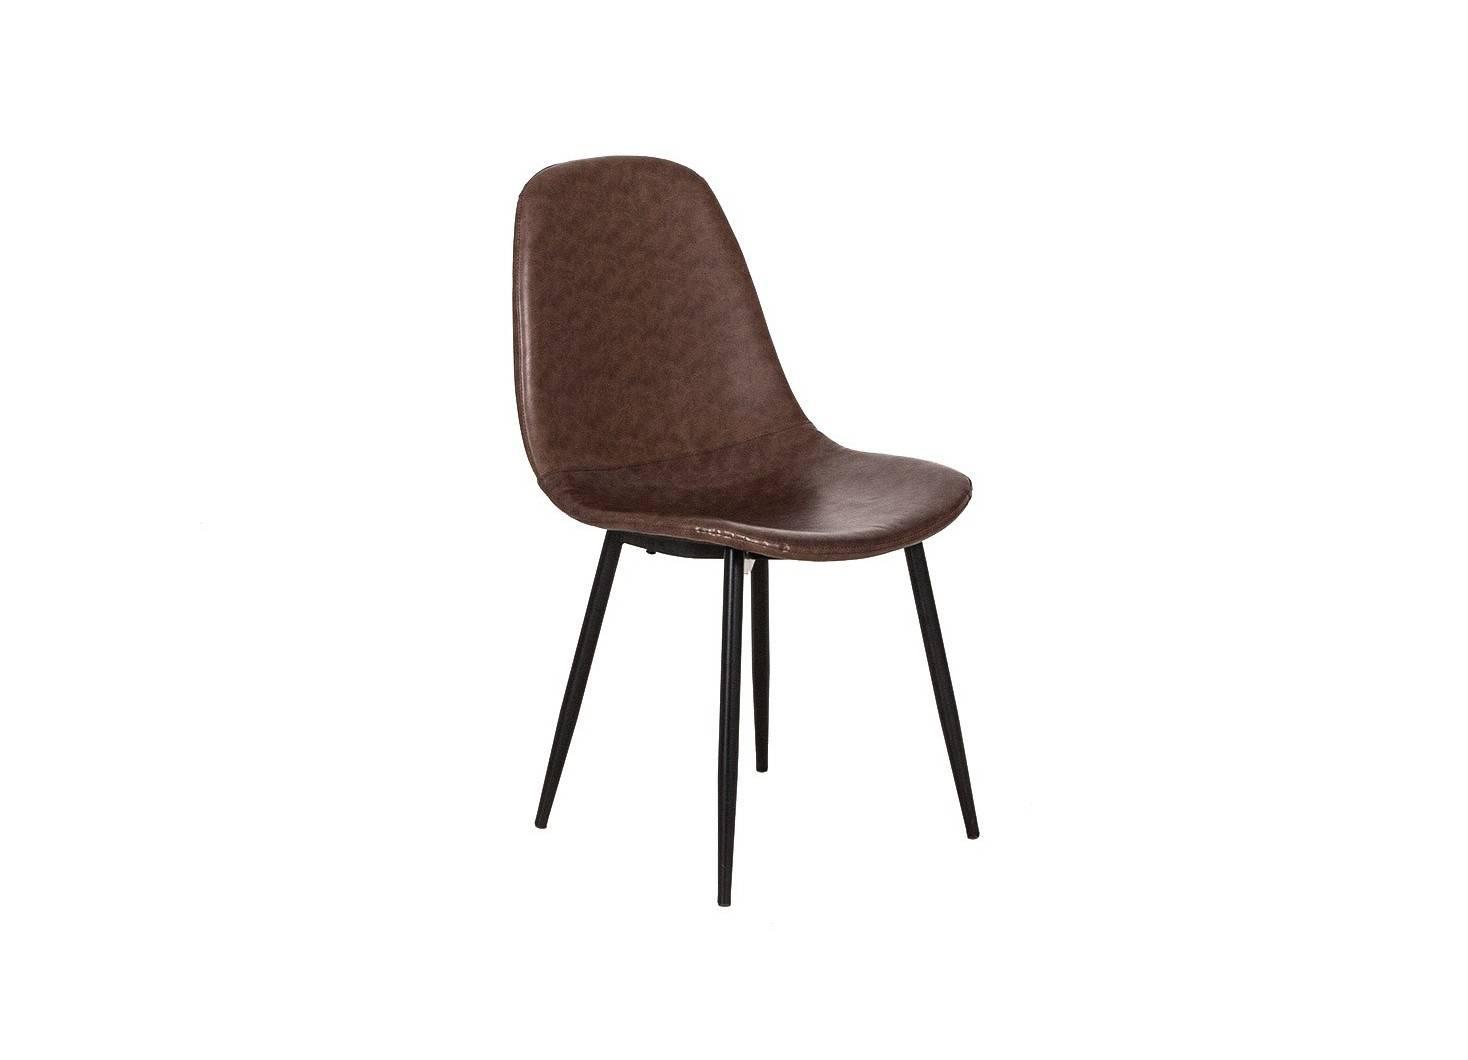 Chaise en simili cuir marron